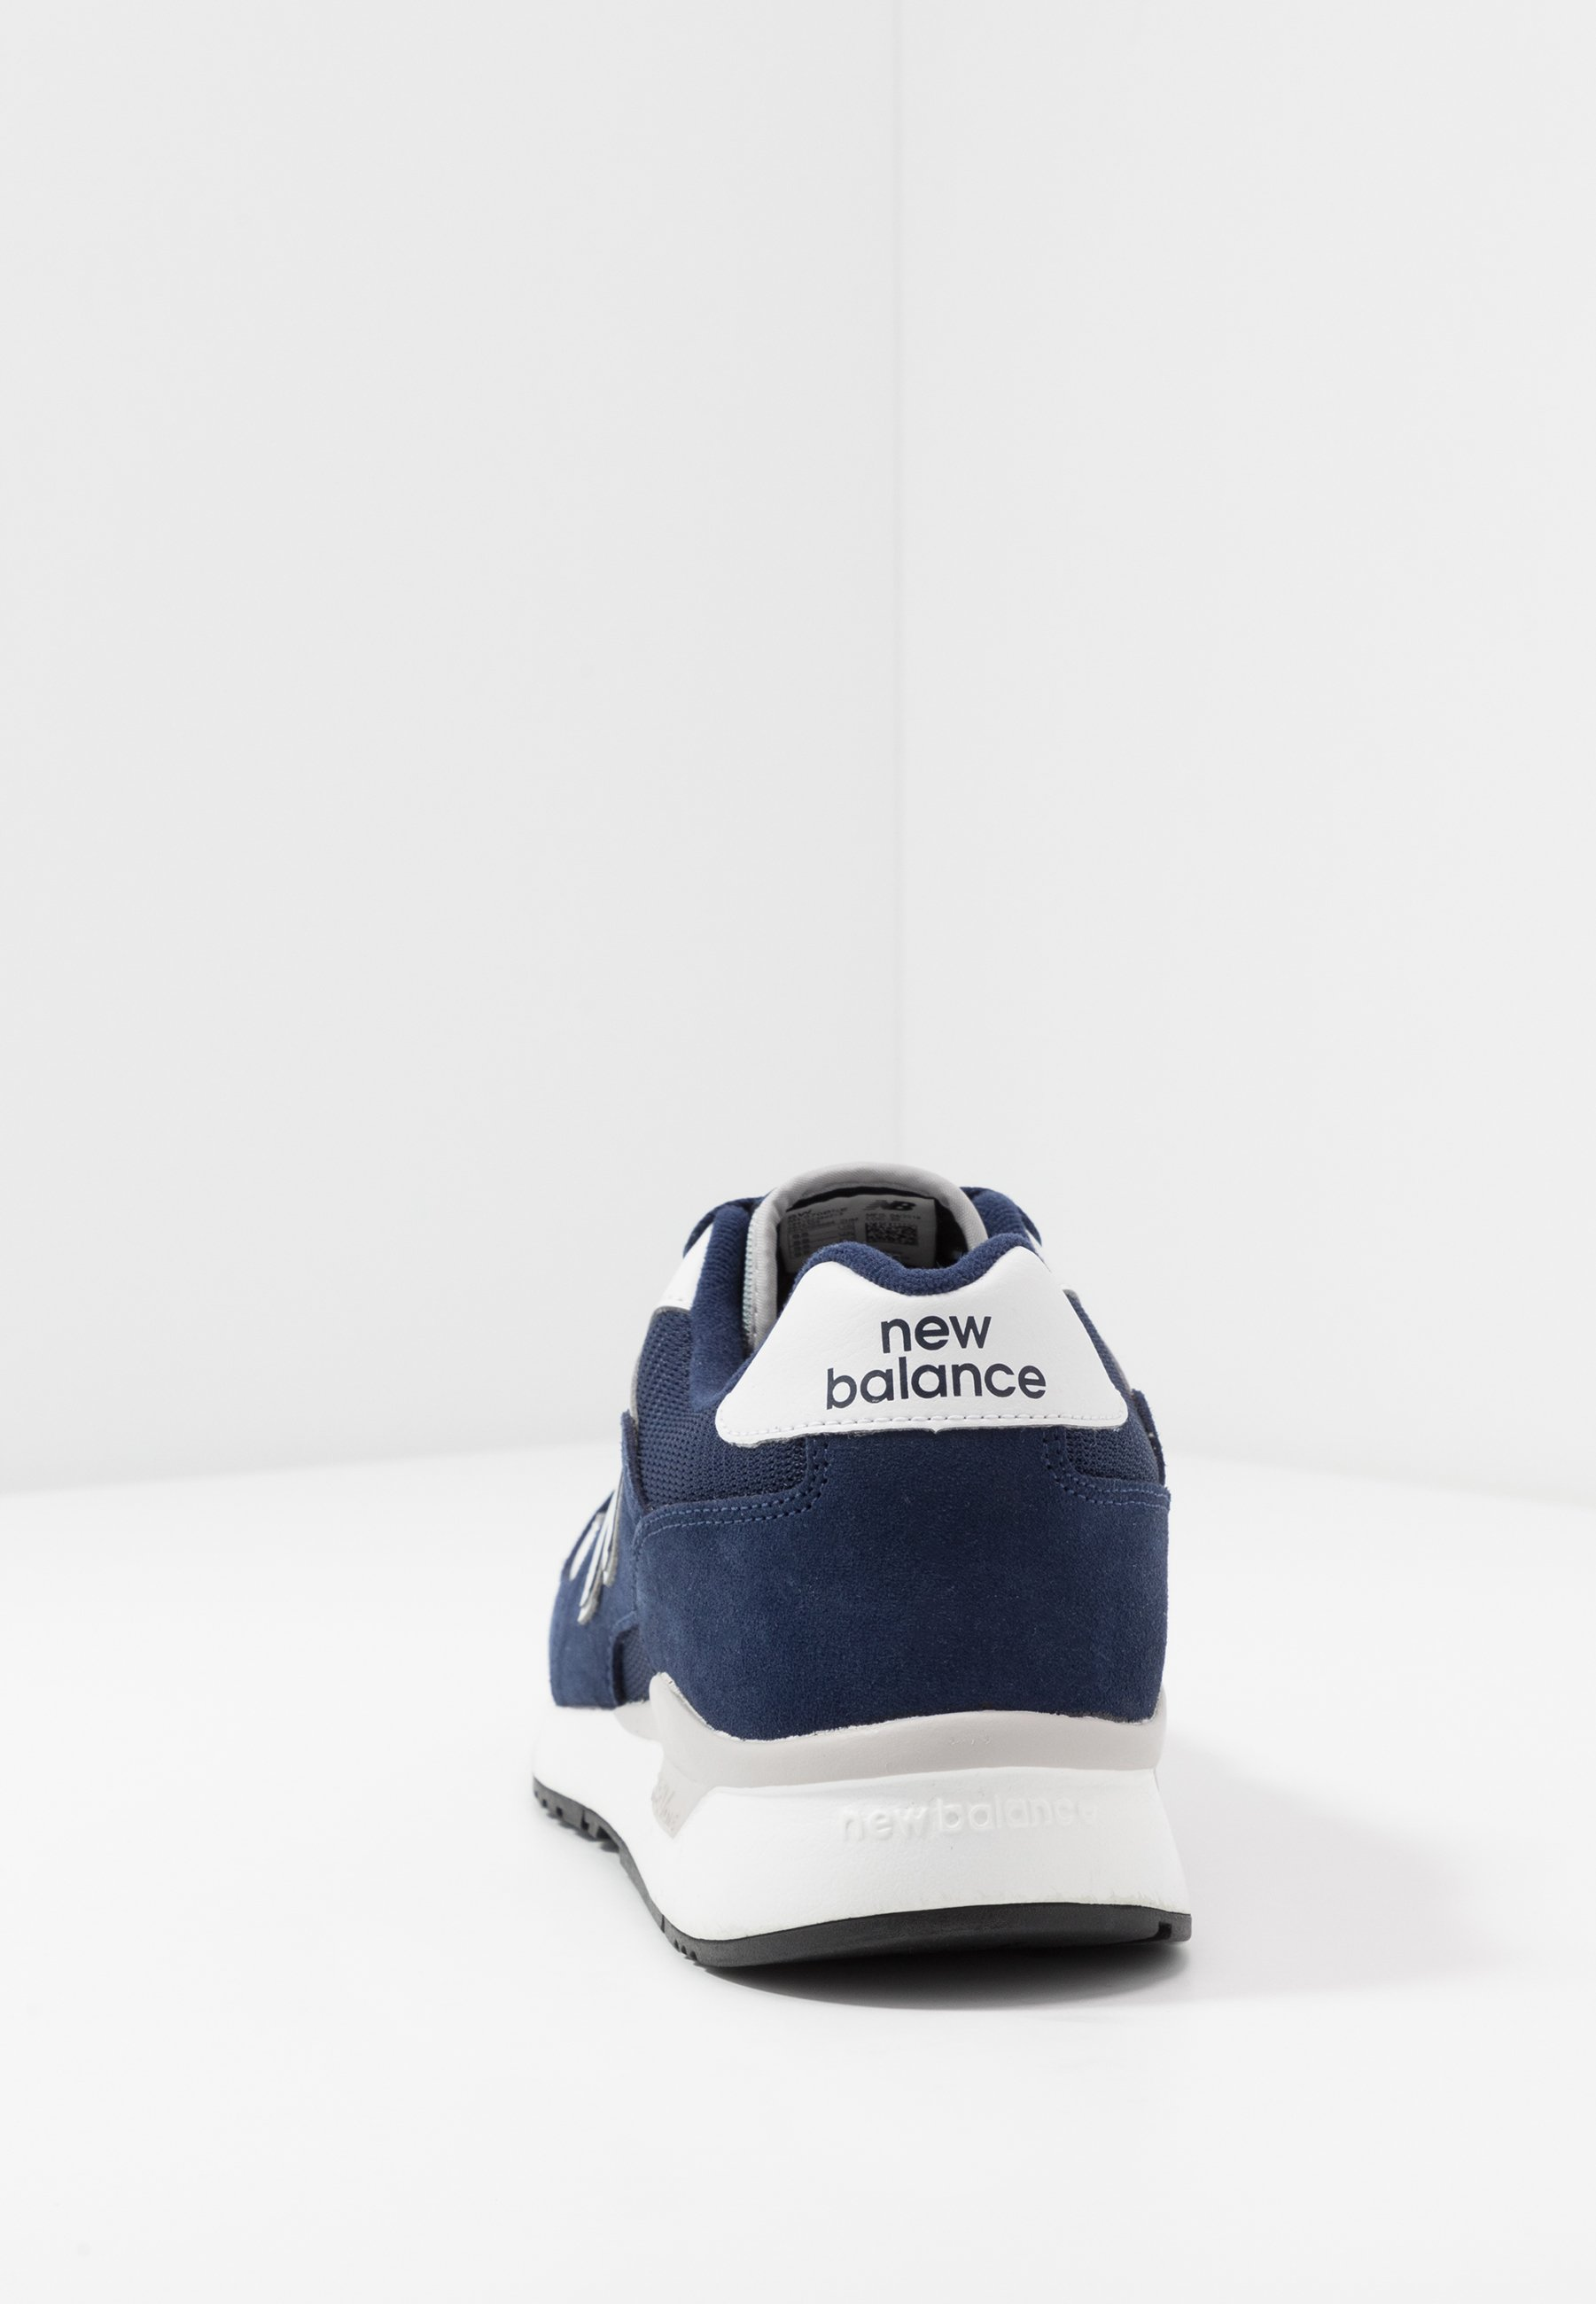 new balance 570 femme